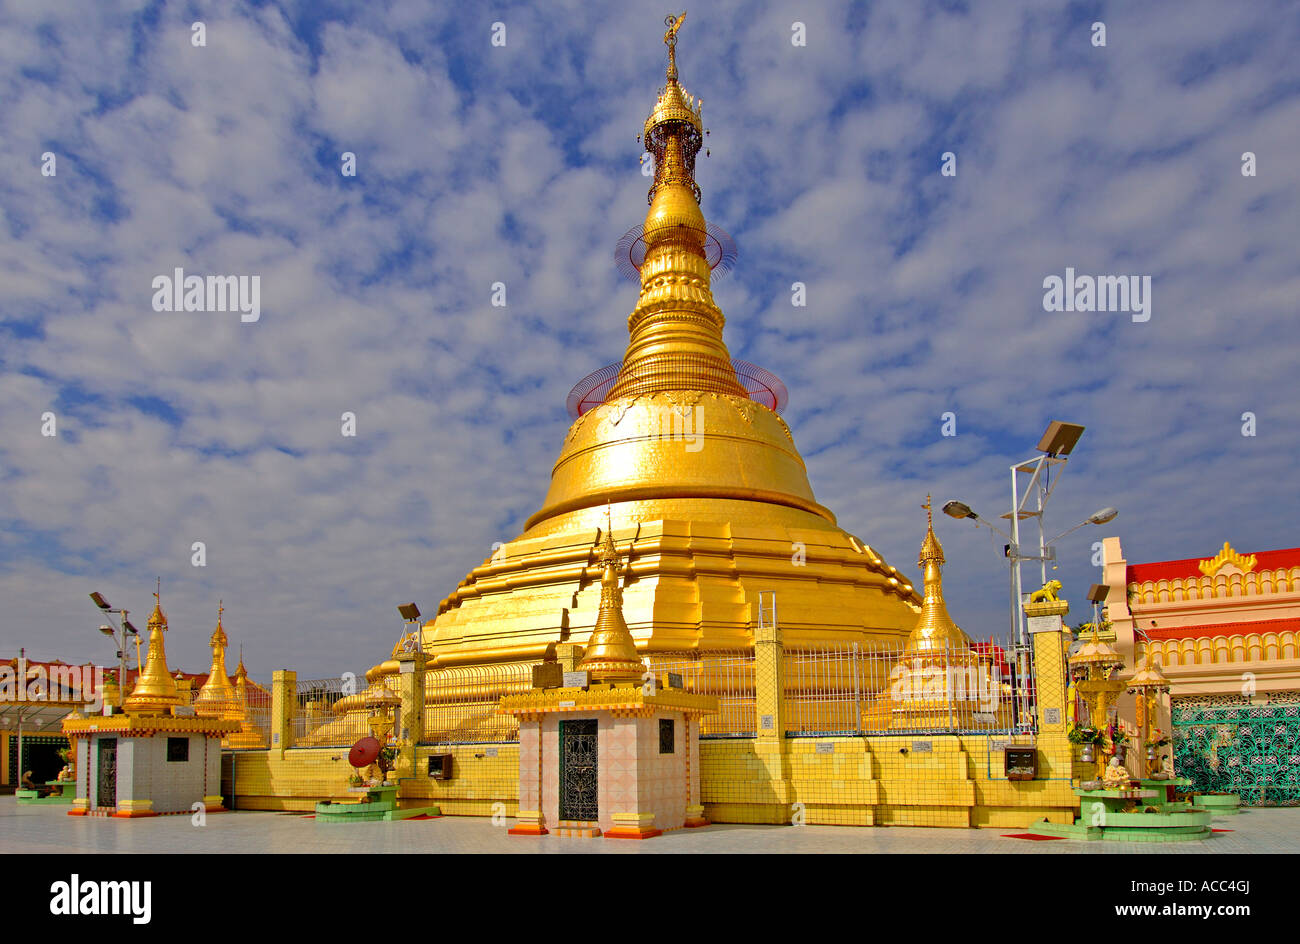 Burma Myanmar Botataung Pagode - Stock Image